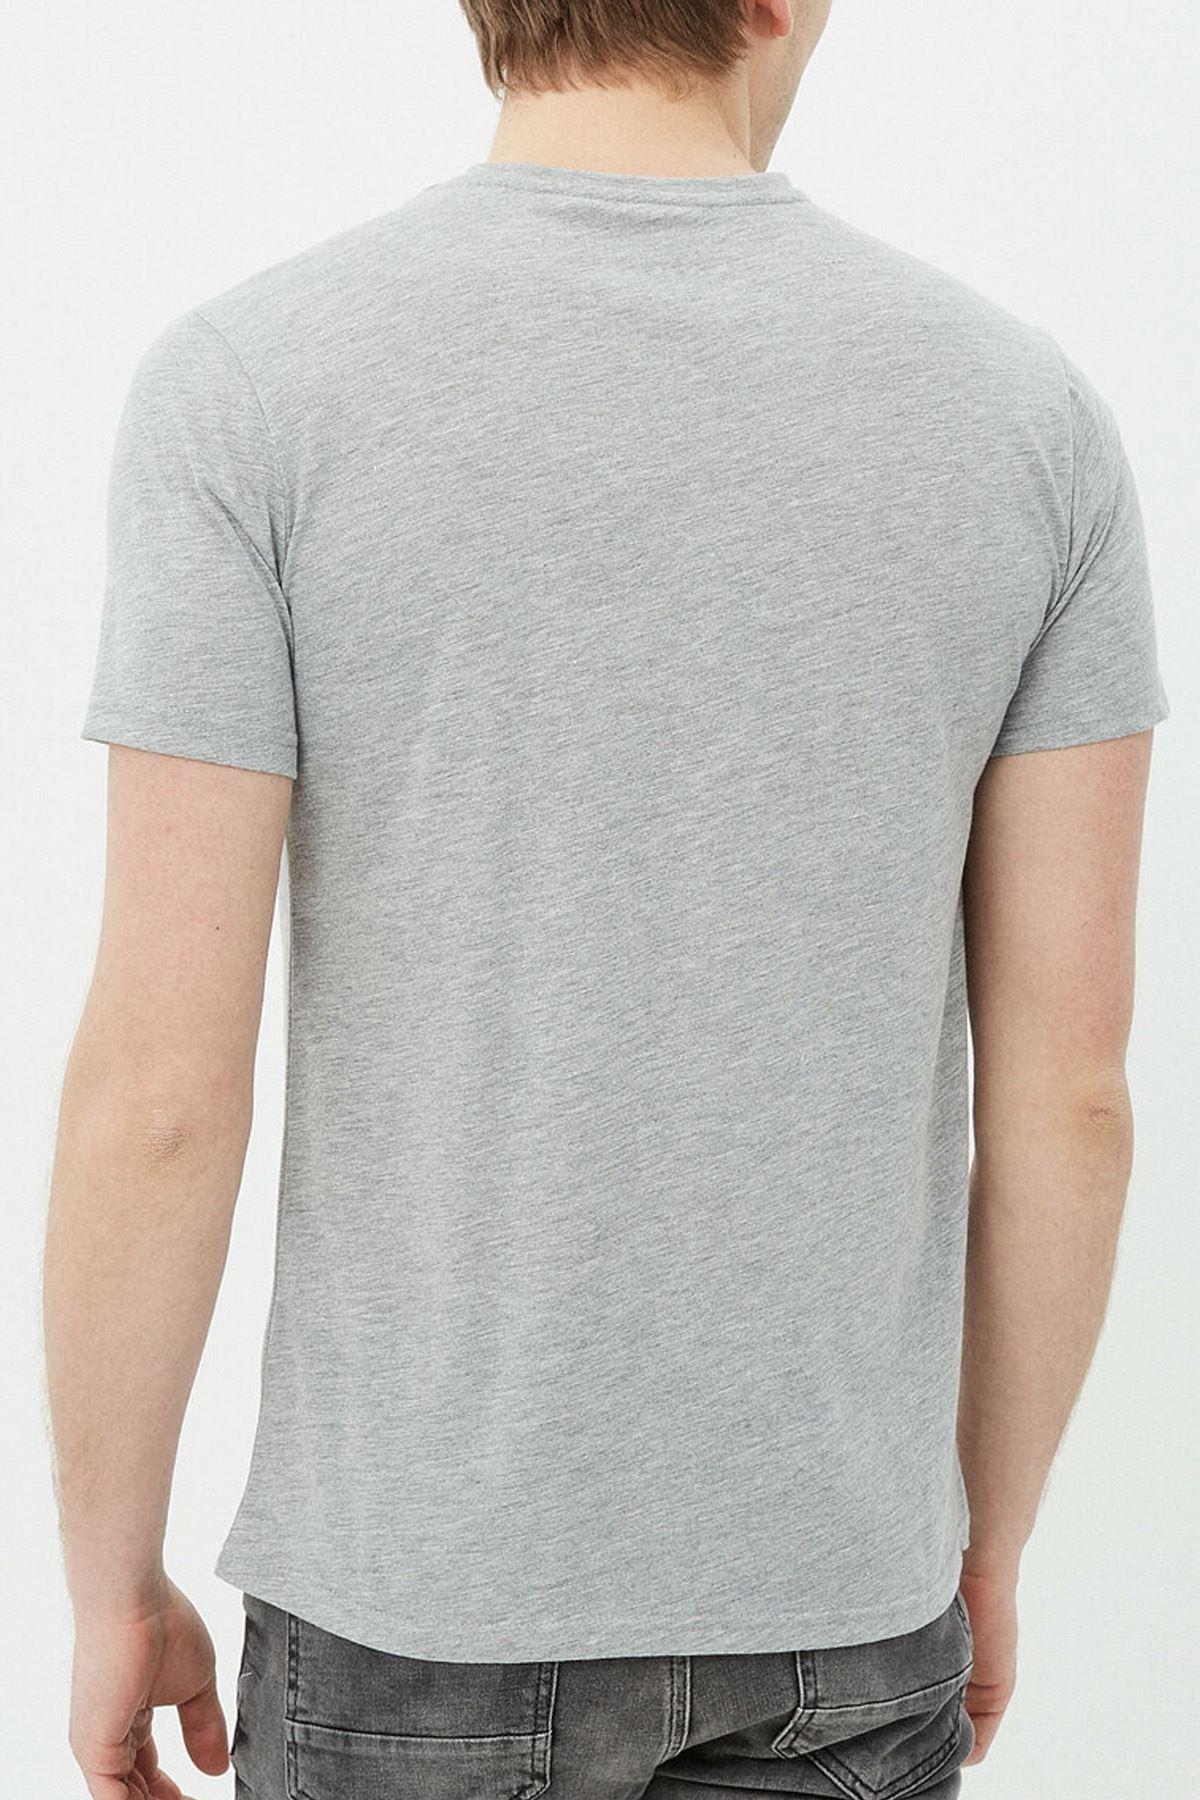 Anime Death Note 04 Gri Erkek Tshirt - Tişört